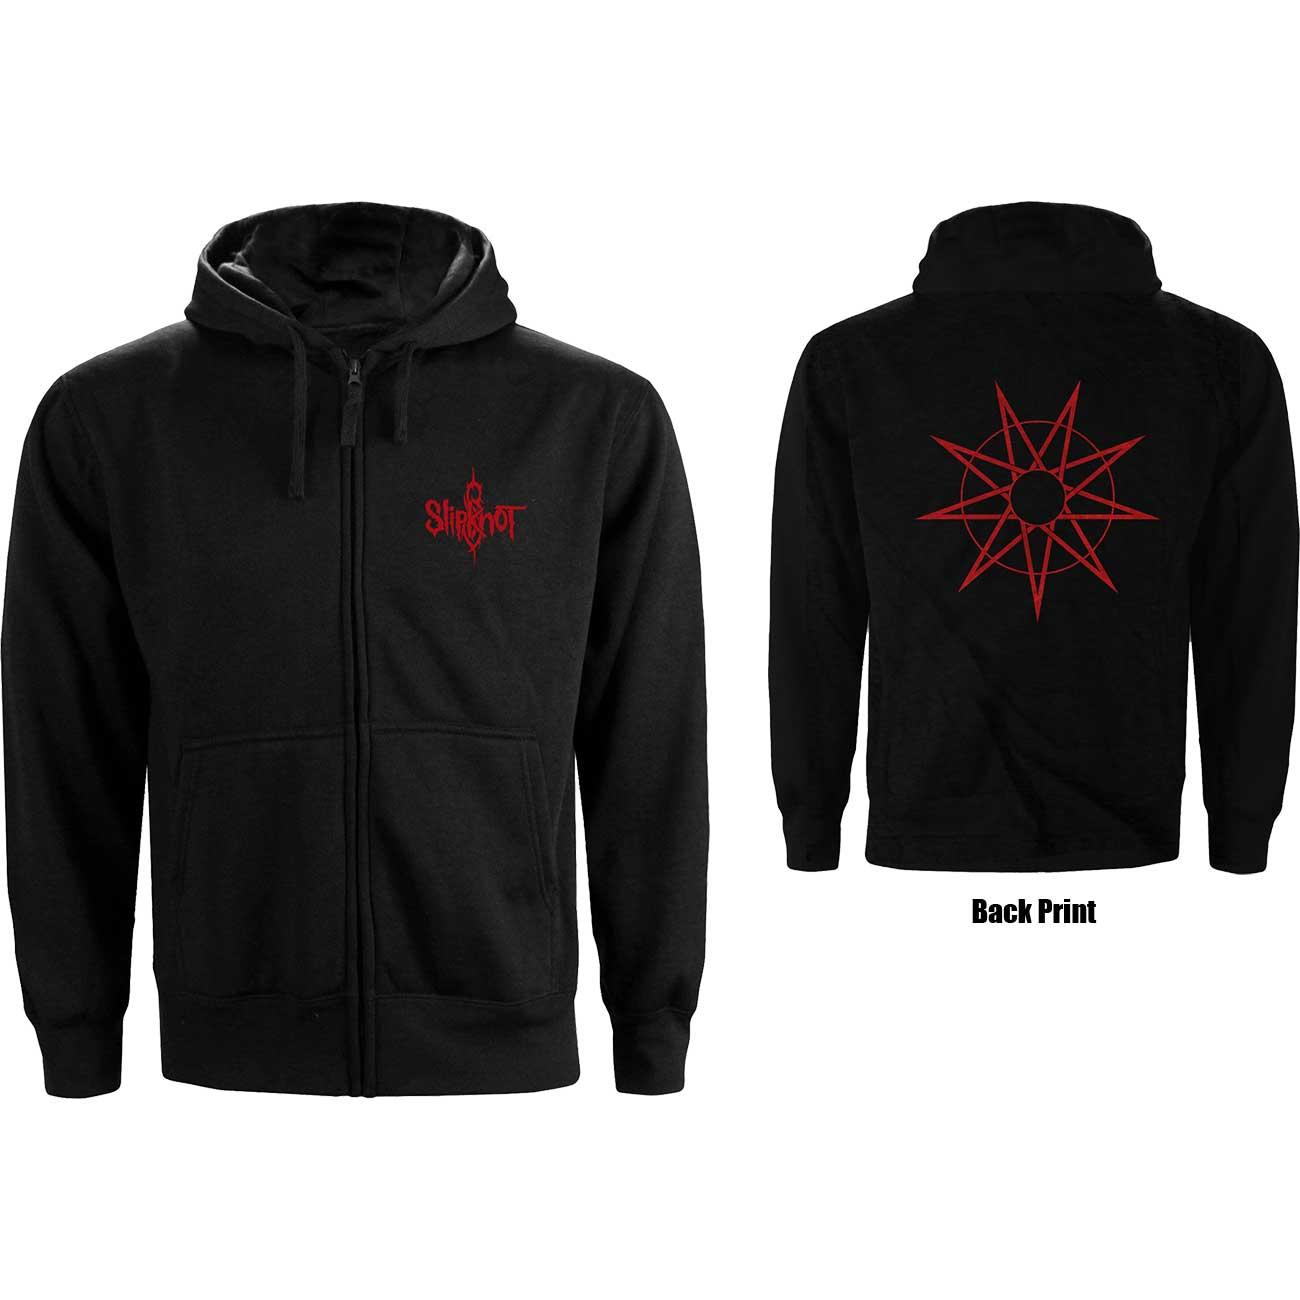 Slipknot Unisex Zipped Hoodie 9 Point Star Back Print